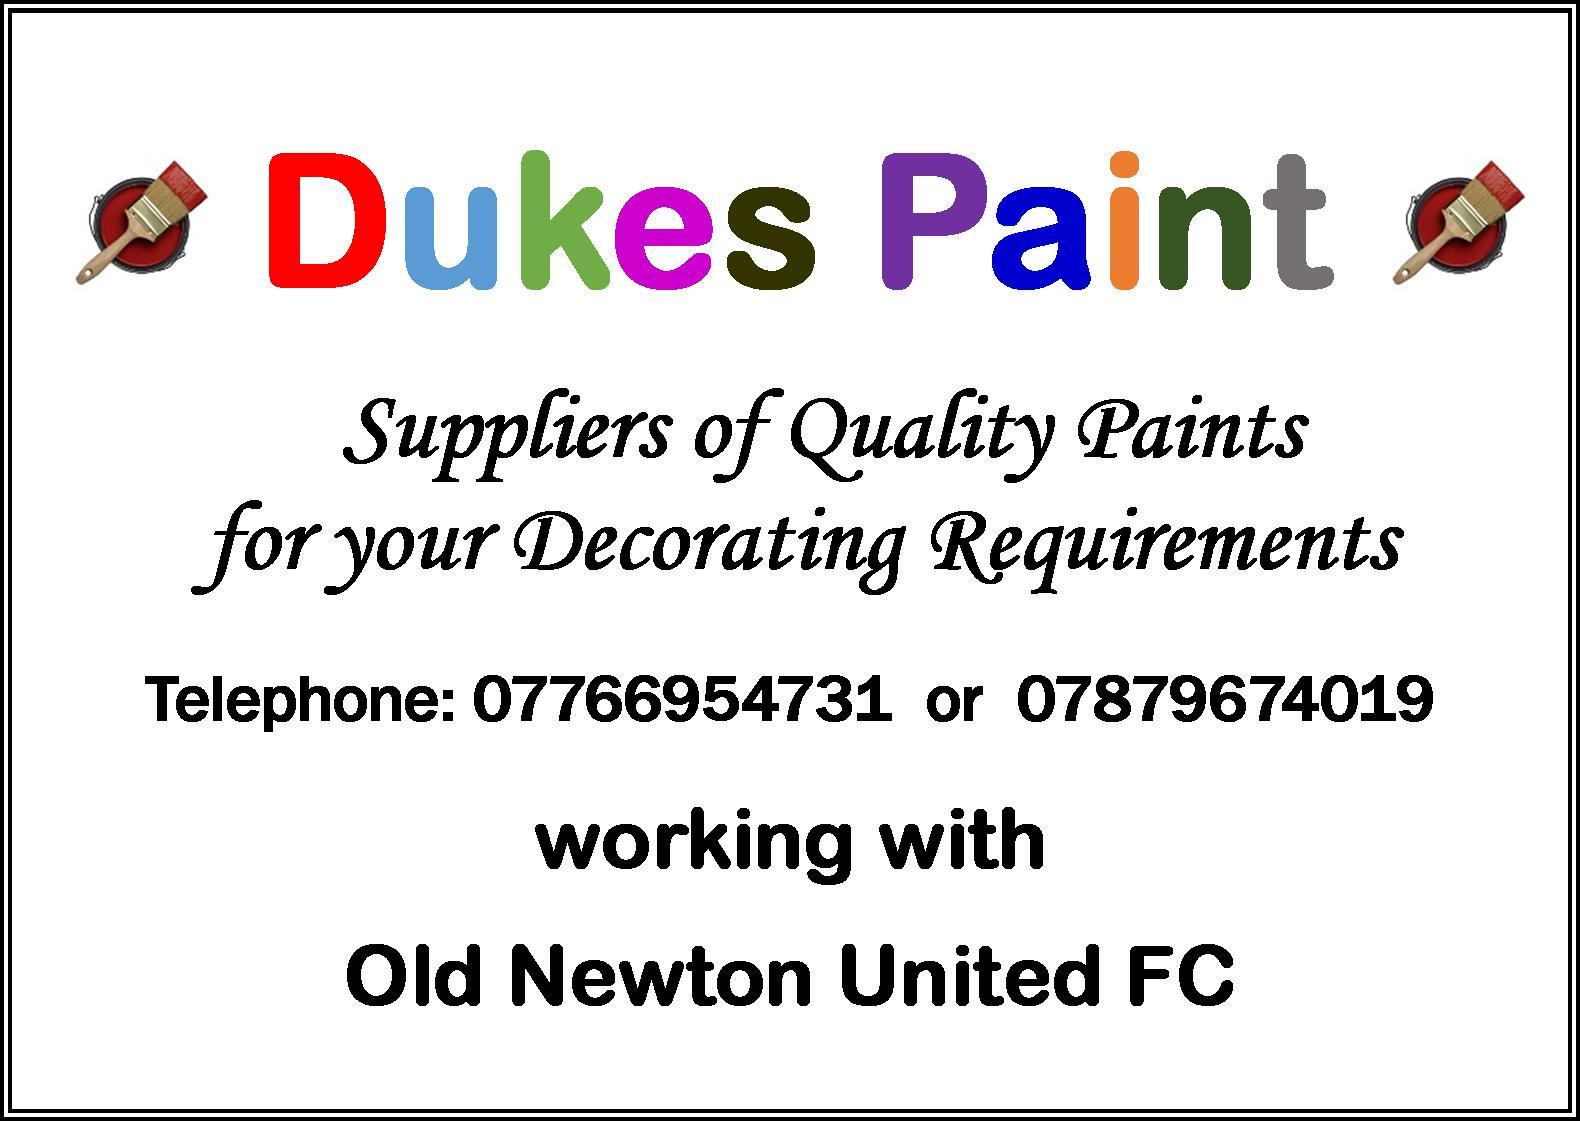 Dukes Paint